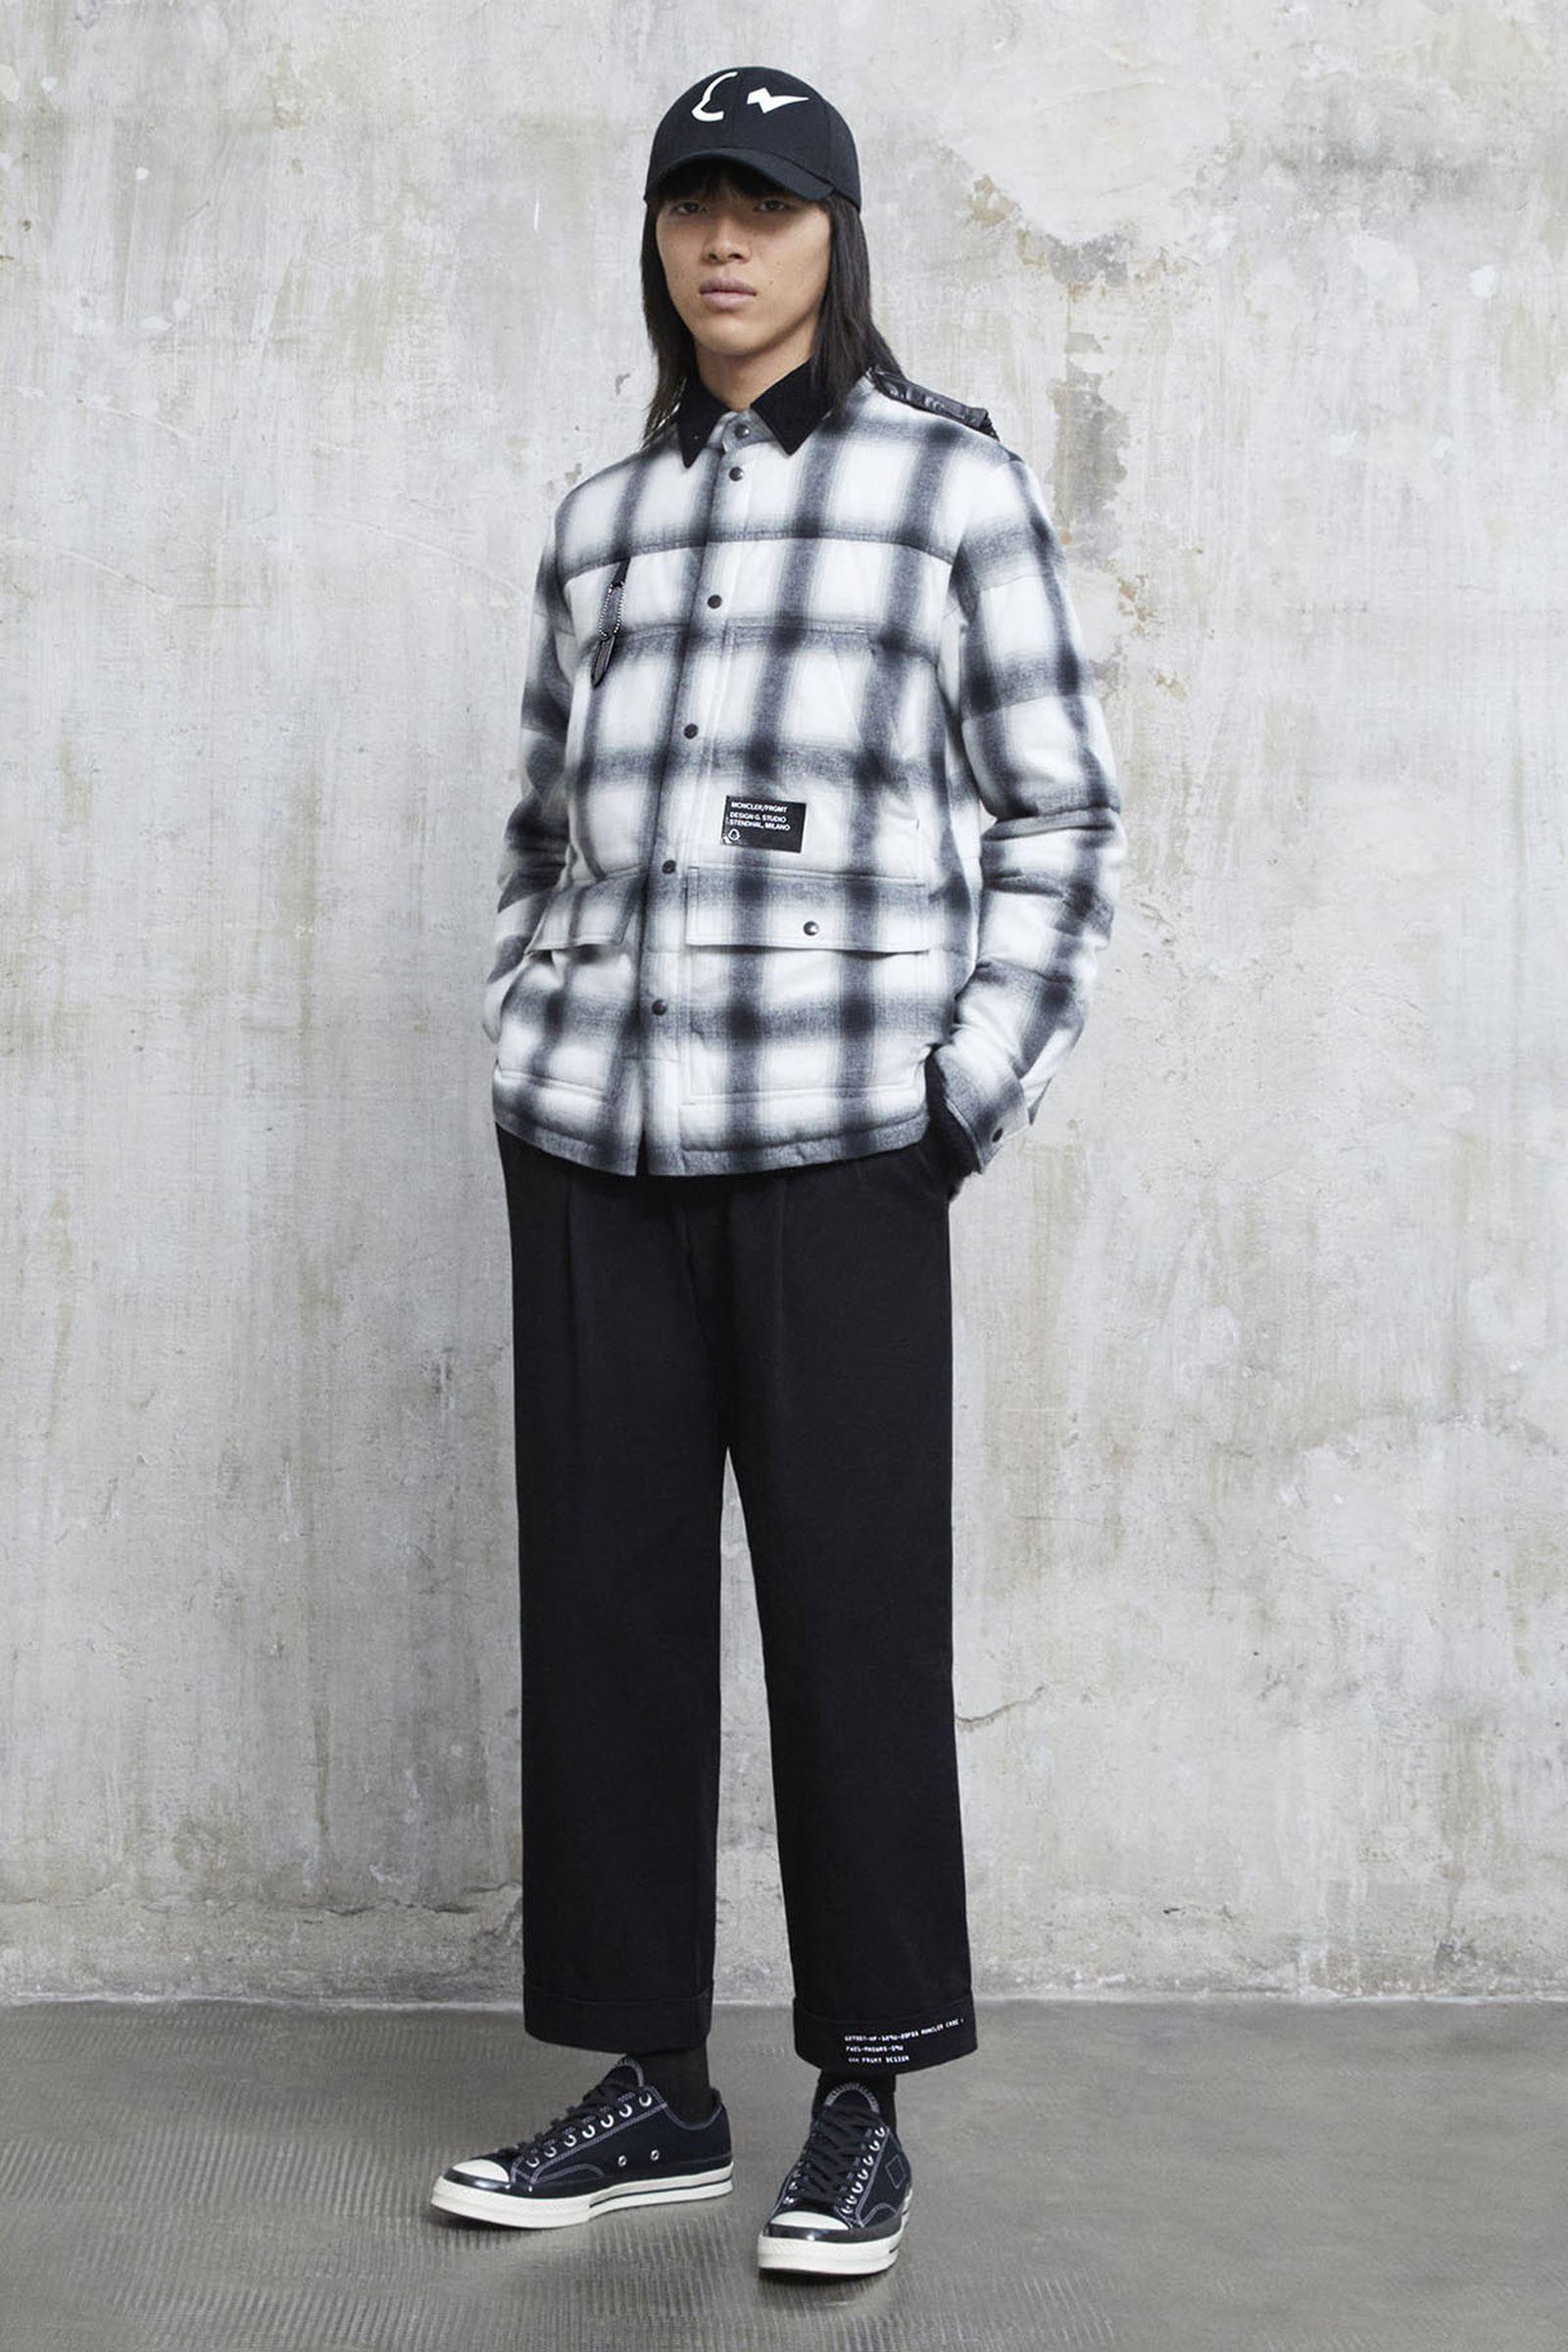 moncler-frgmt-hiroshi-fujiwara-fw21-13